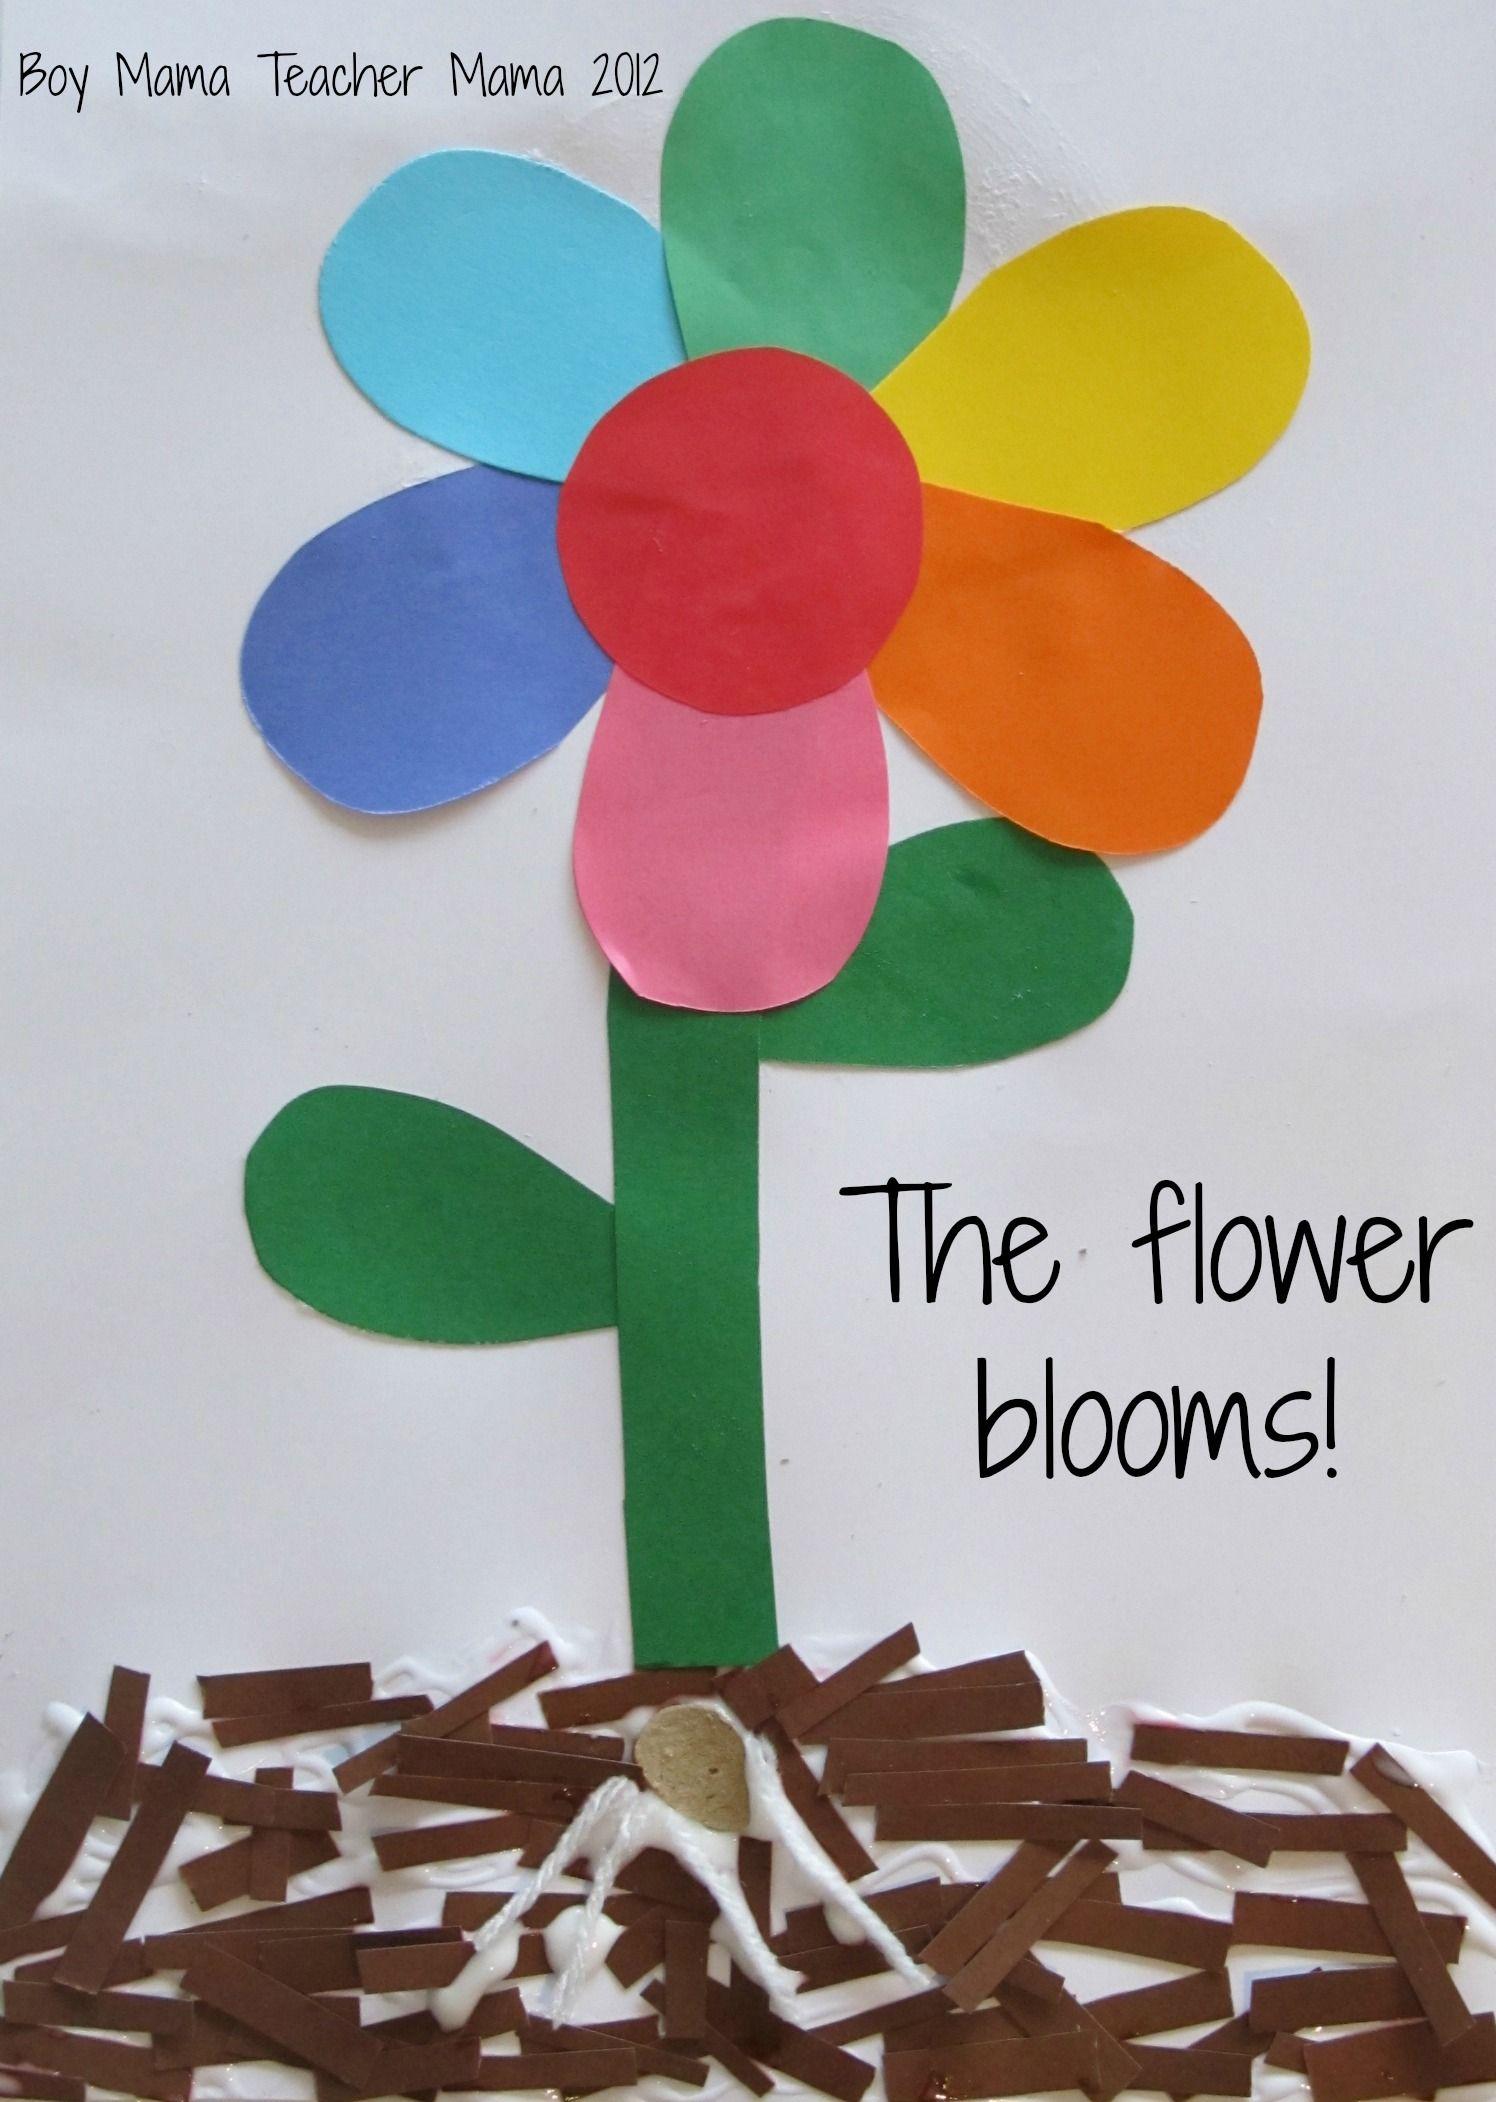 Book Mama Planting A Rainbow By Lois Ehlert Planting A Rainbow